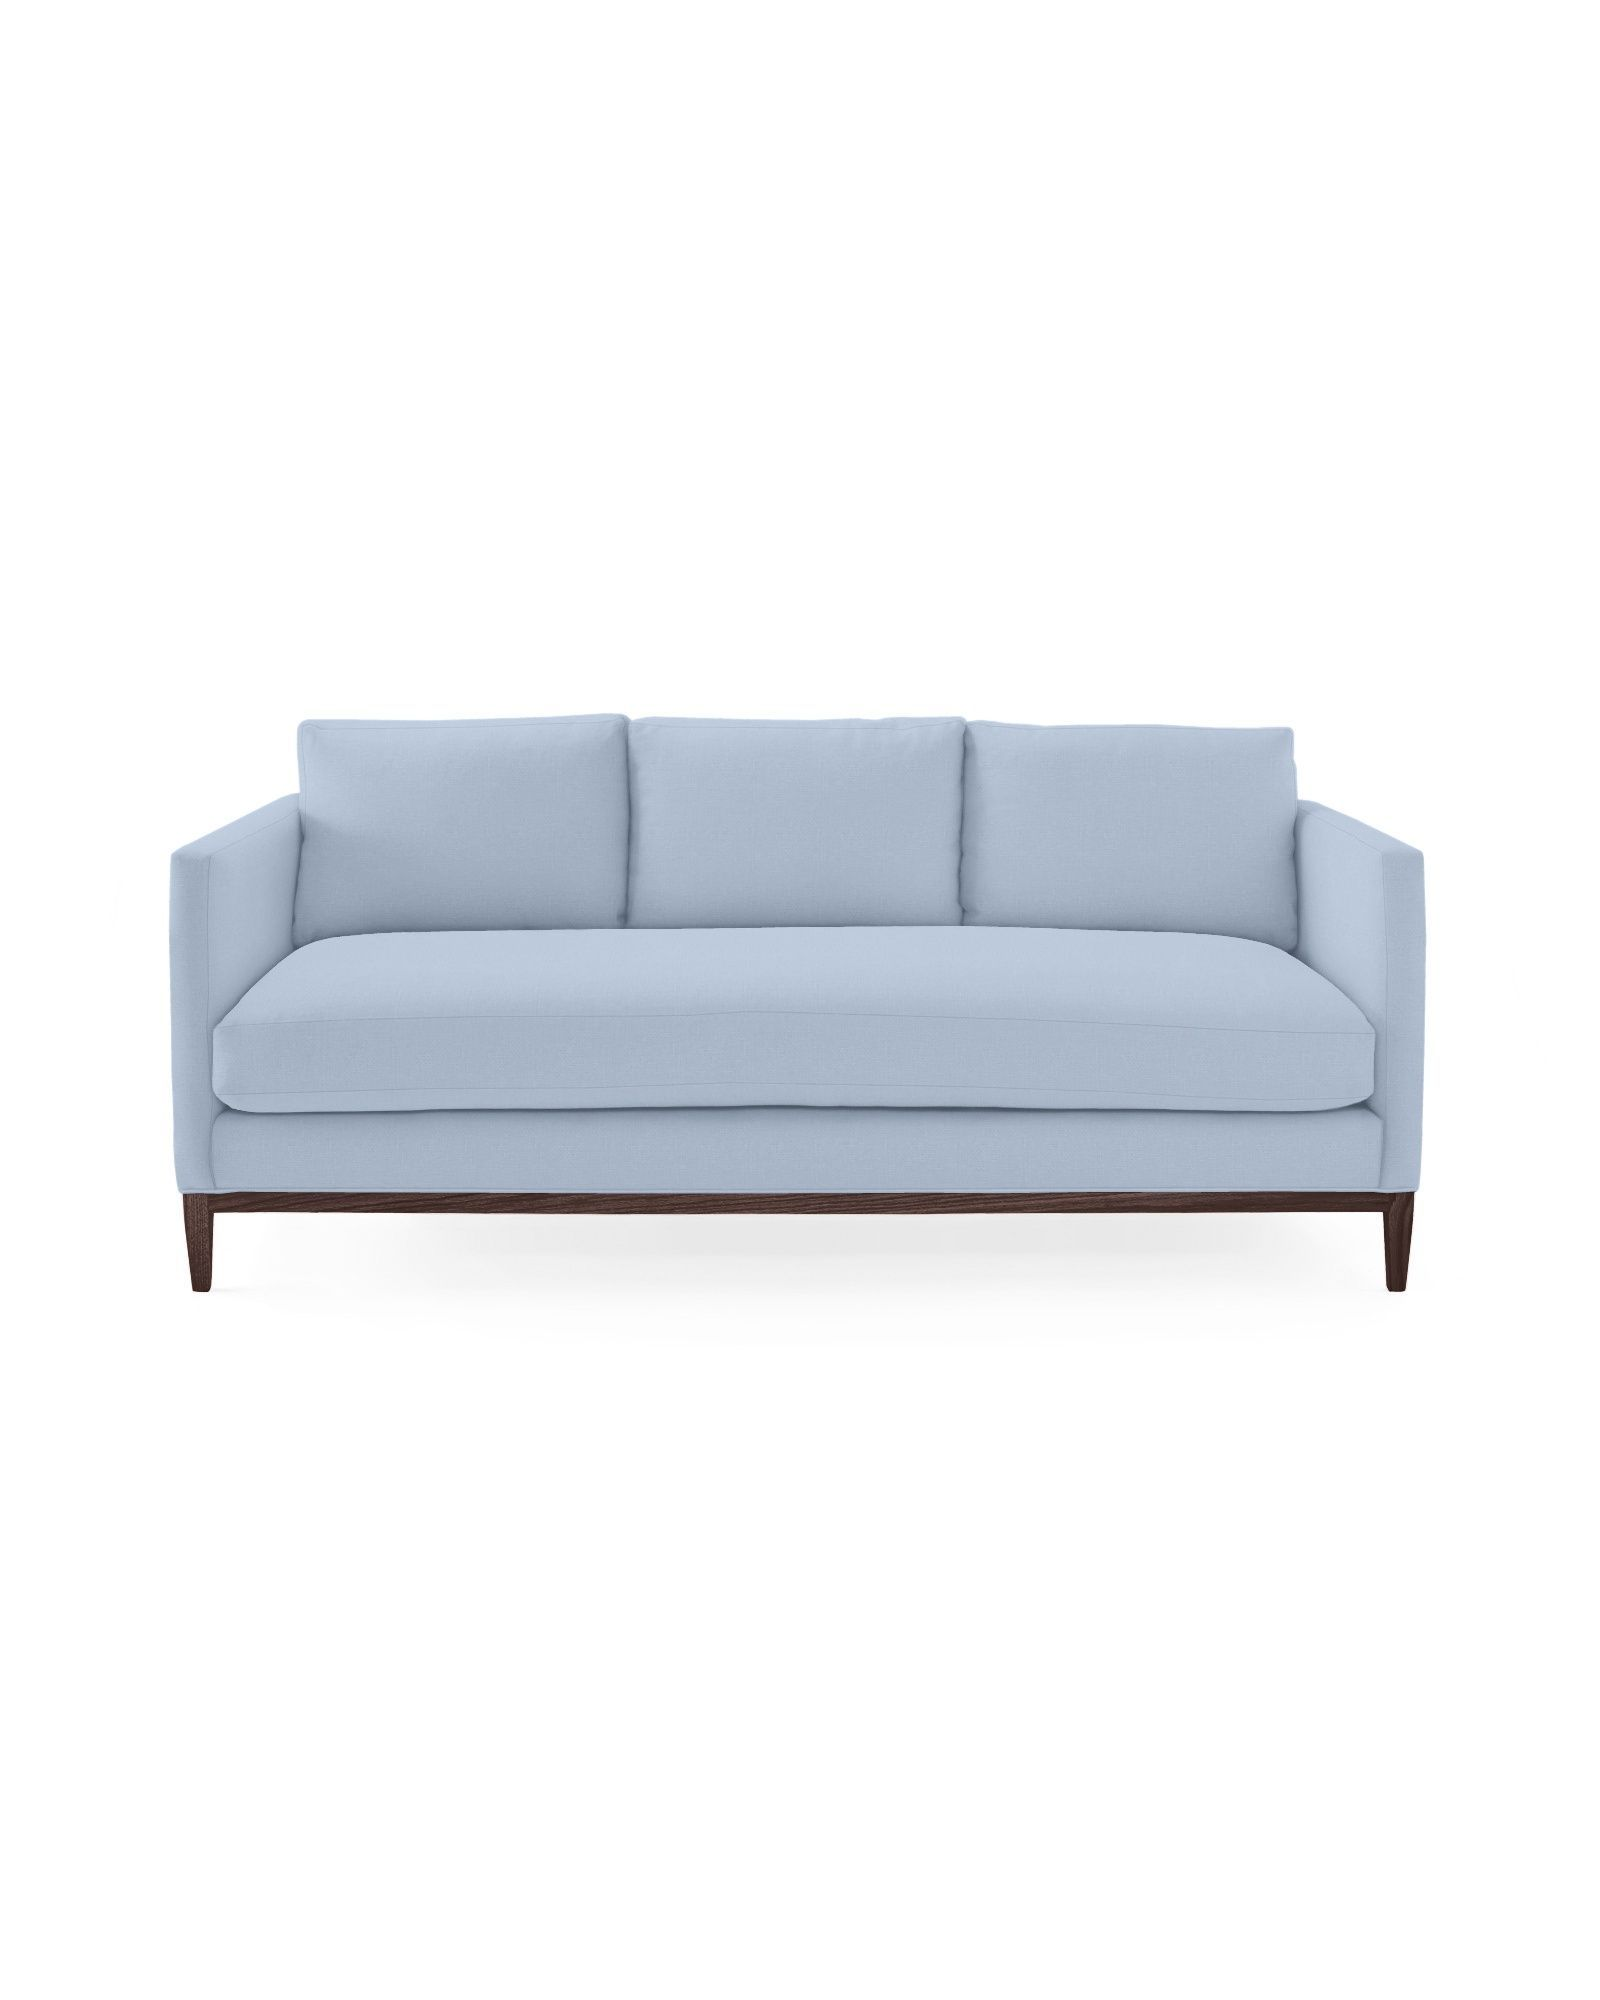 Sensational Barton Sofa Cjindustries Chair Design For Home Cjindustriesco